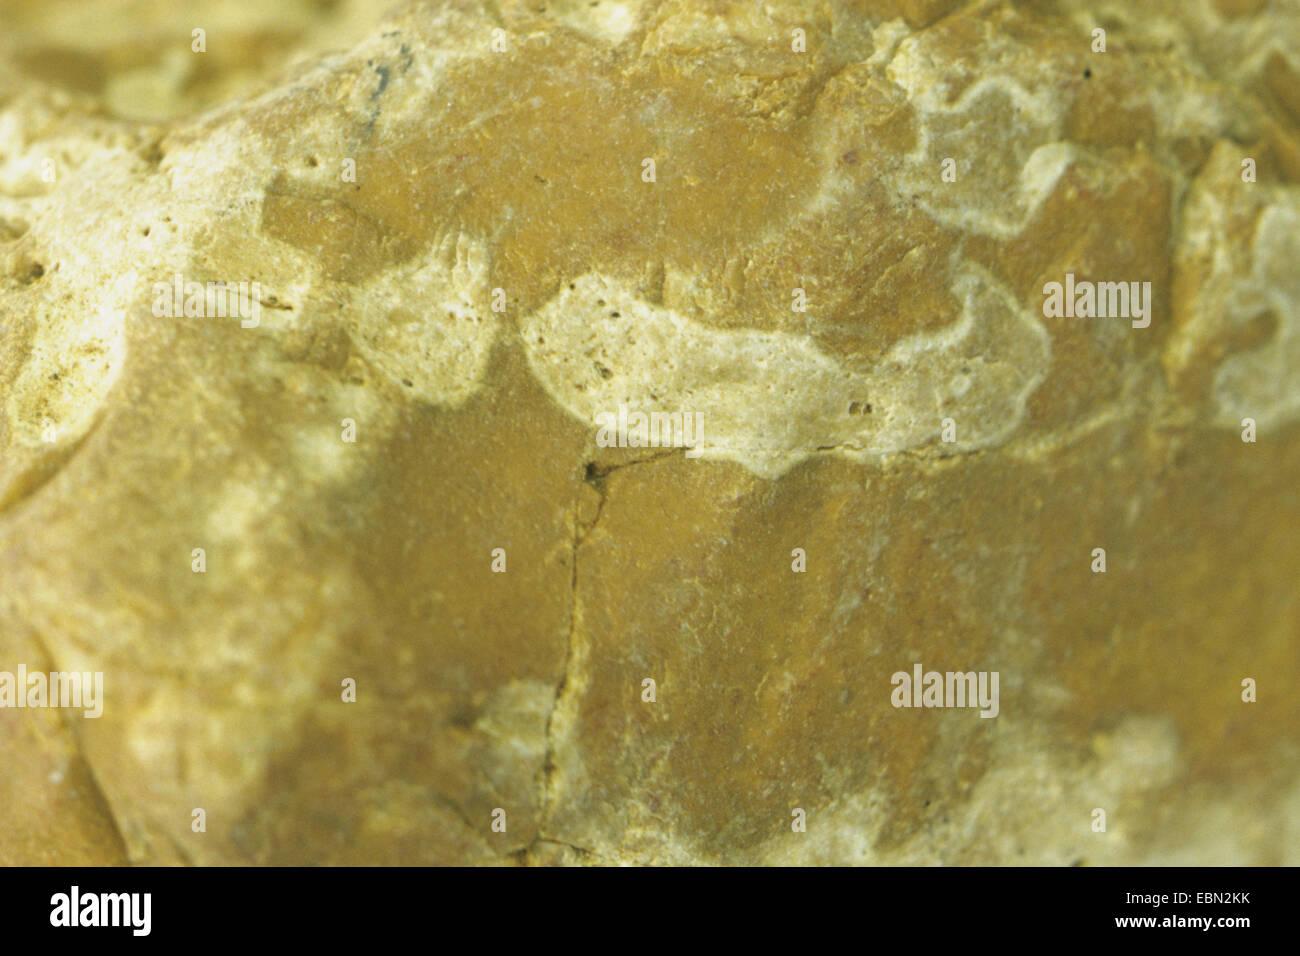 brown flint, Germany, Baltic Sea - Stock Image